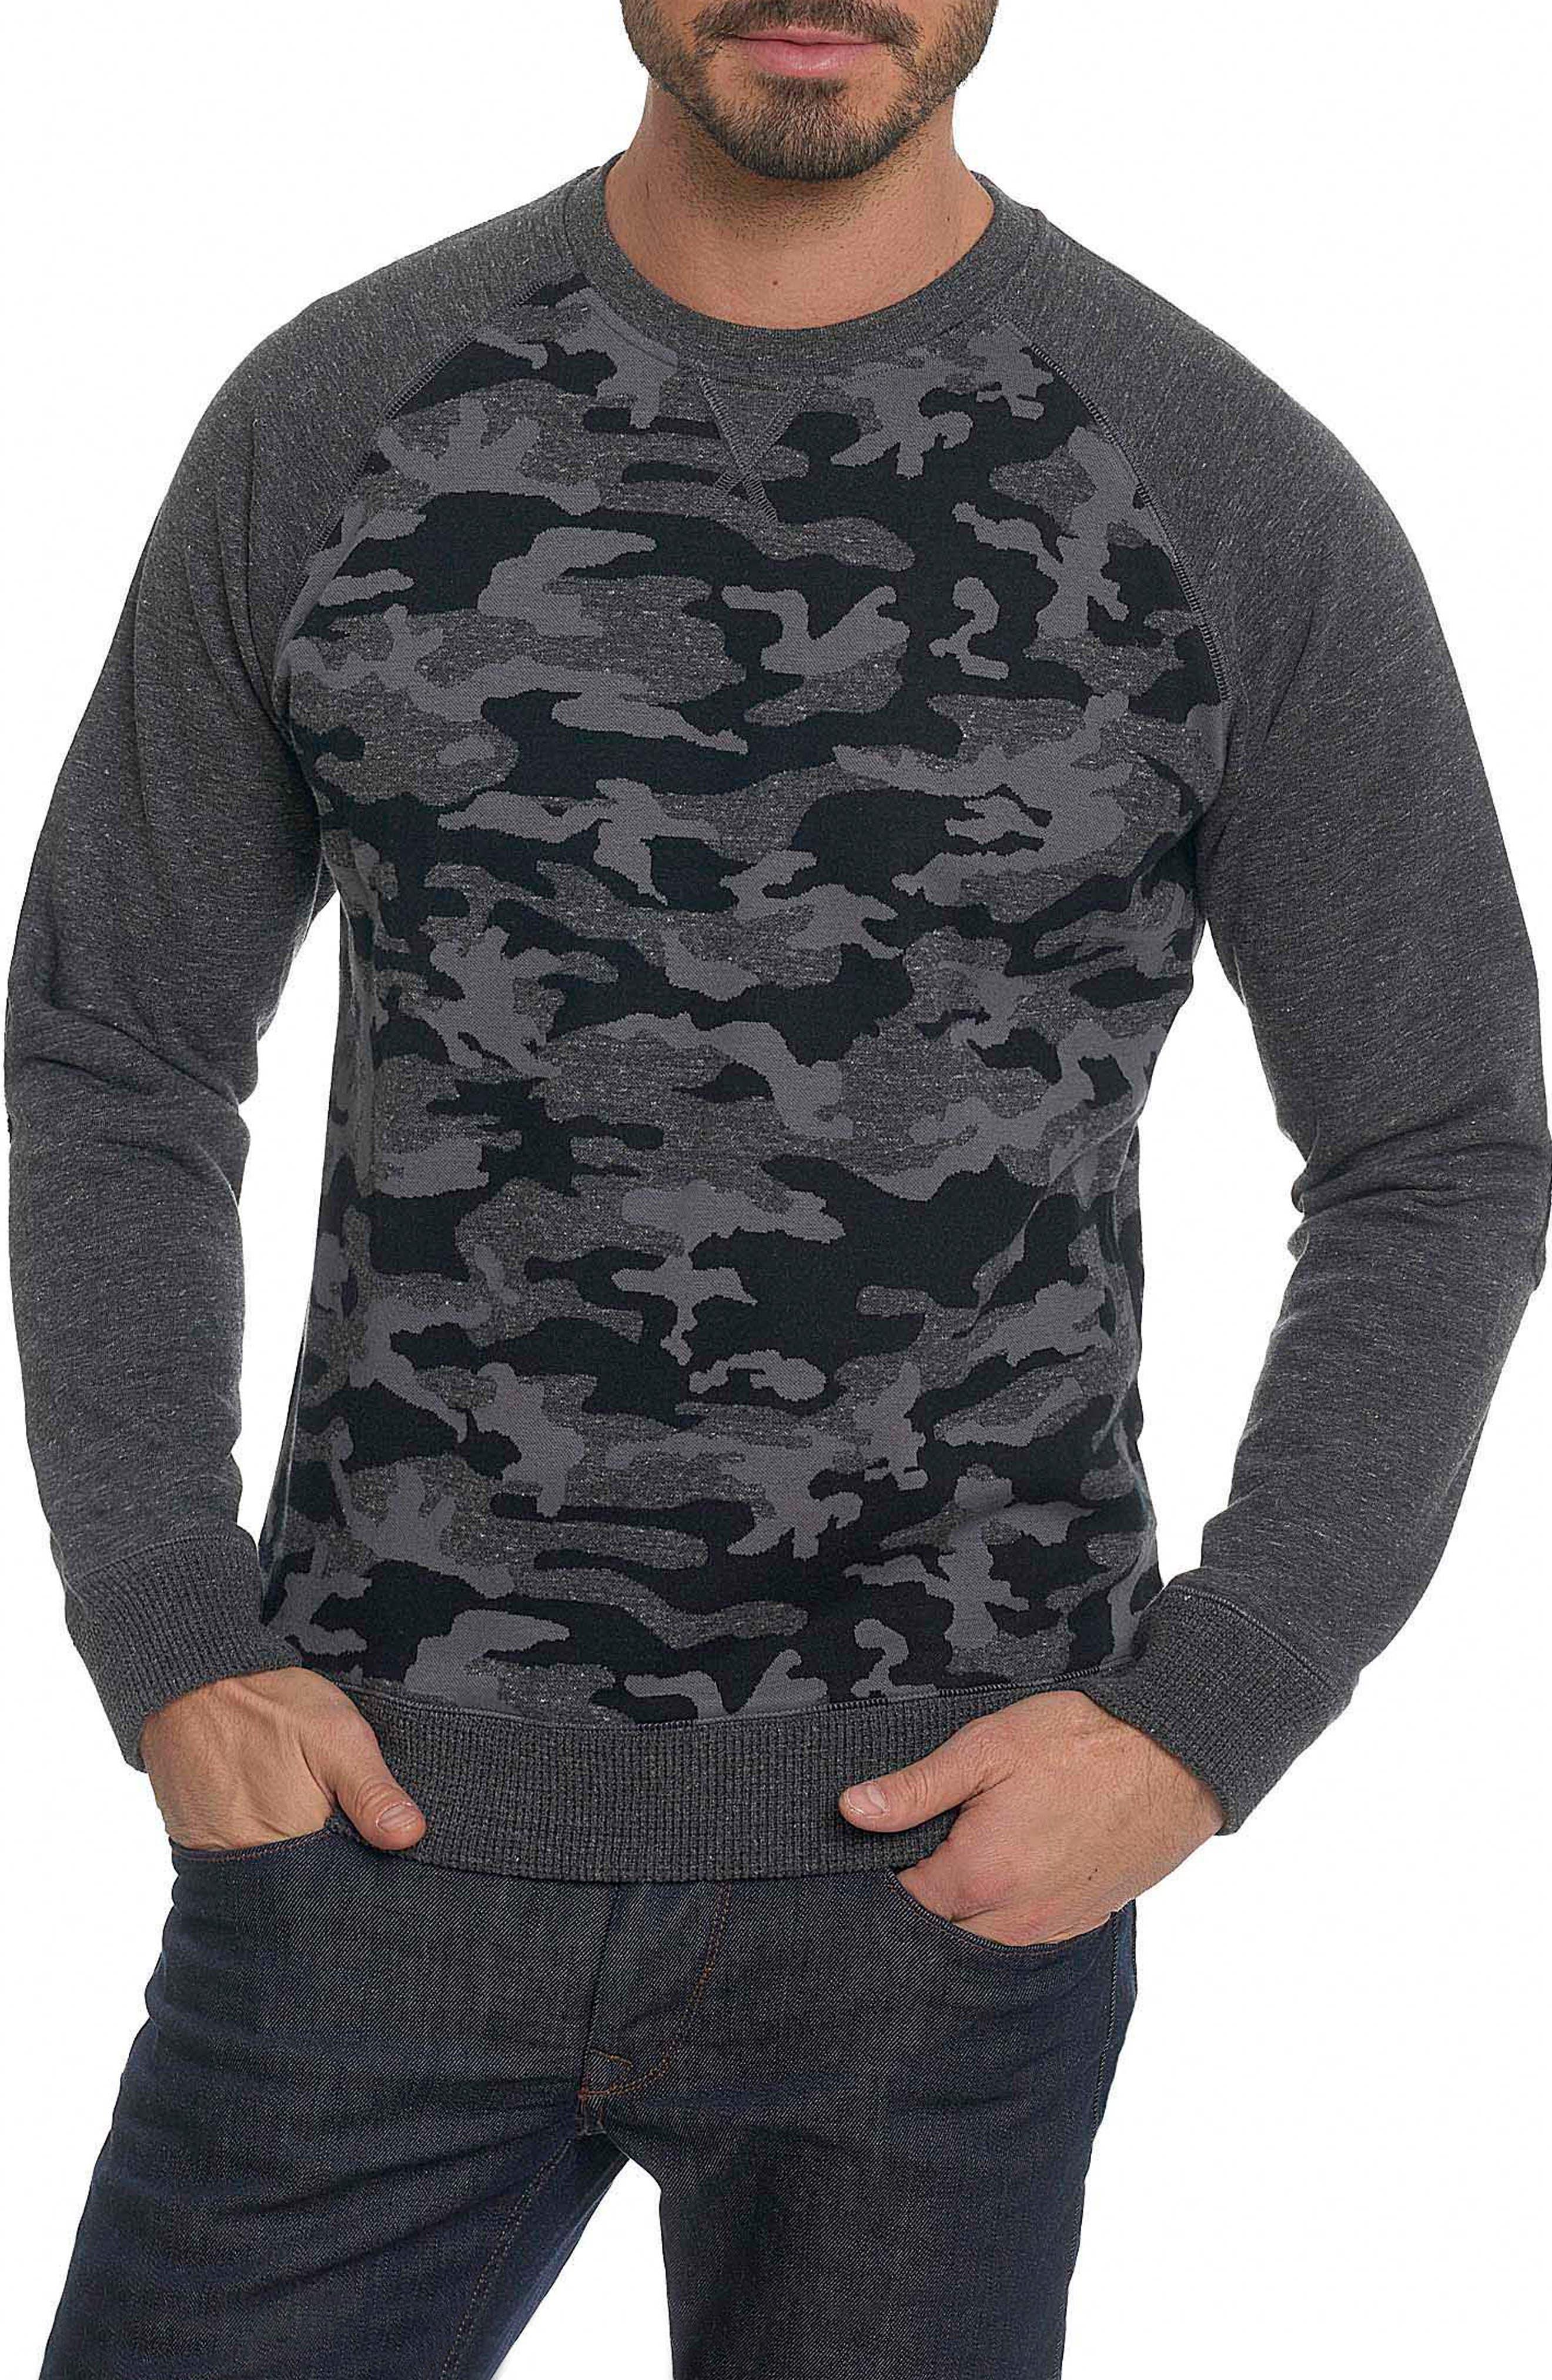 Main Image - Robert Graham Mooers Camo Raglan Sleeve Shirt